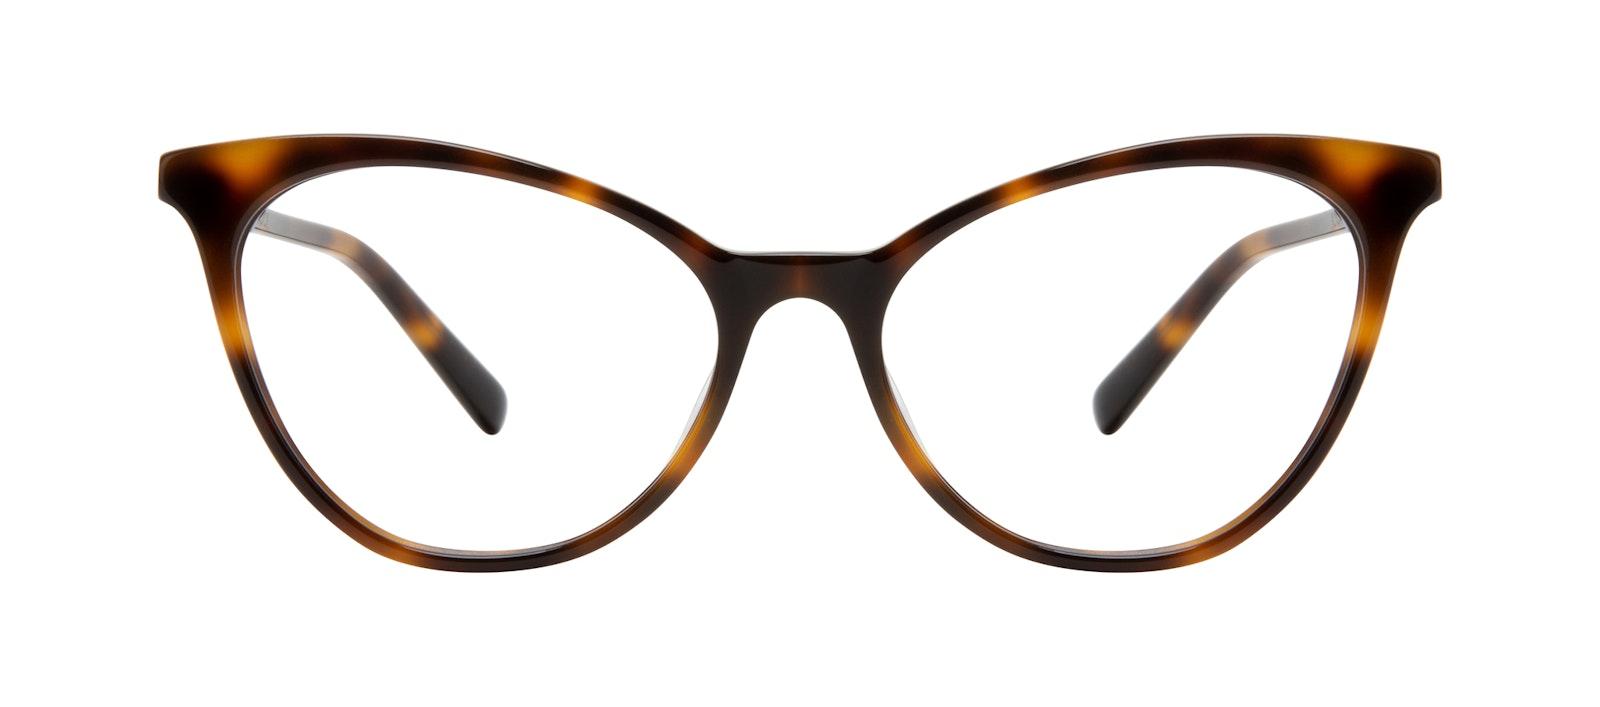 Affordable Fashion Glasses Cat Eye Eyeglasses Women Unreal Tortoise Front